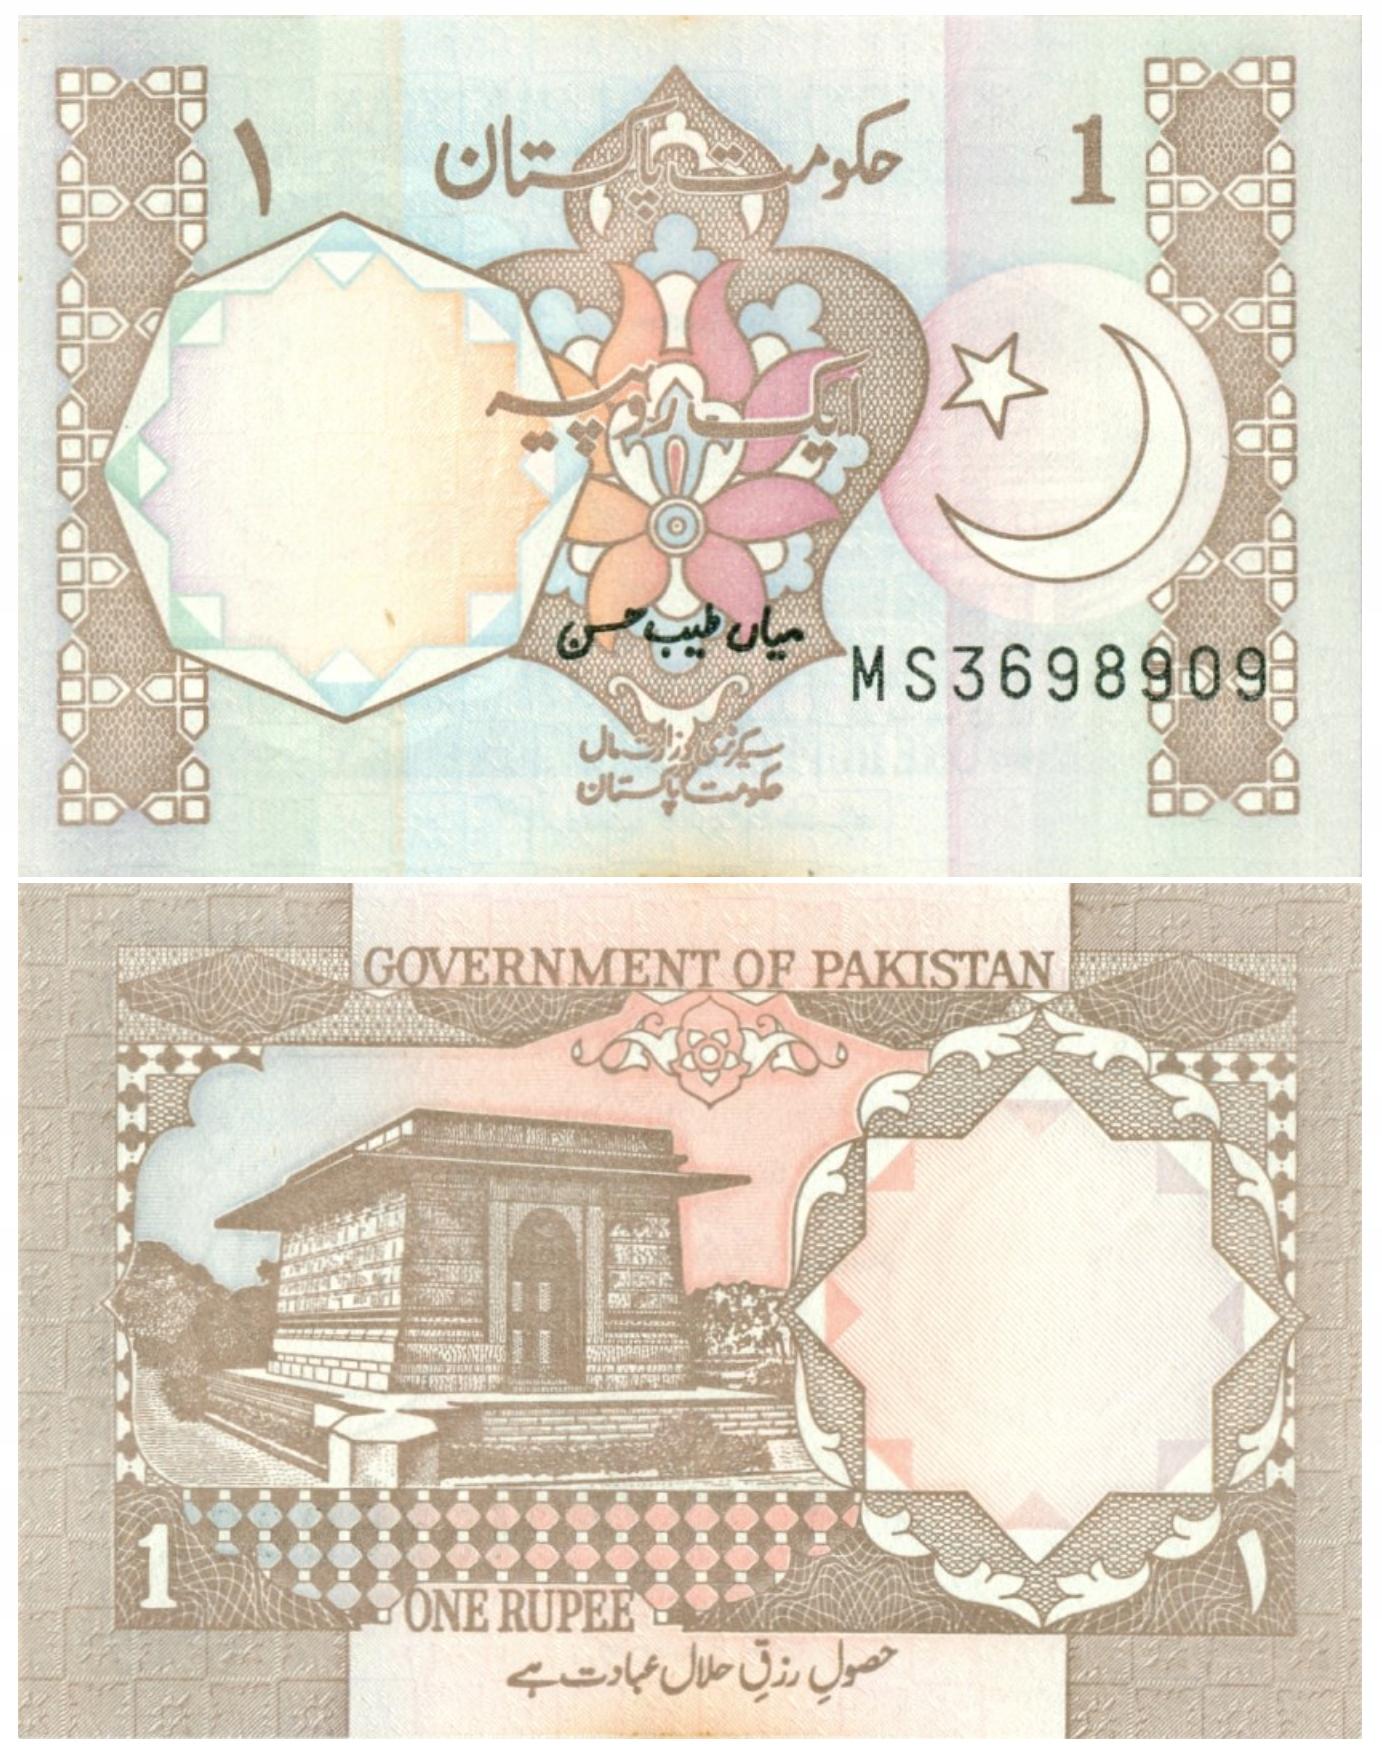 ПАКИСТАН 1 РУПИЛЬ 1983 P-27m UNC